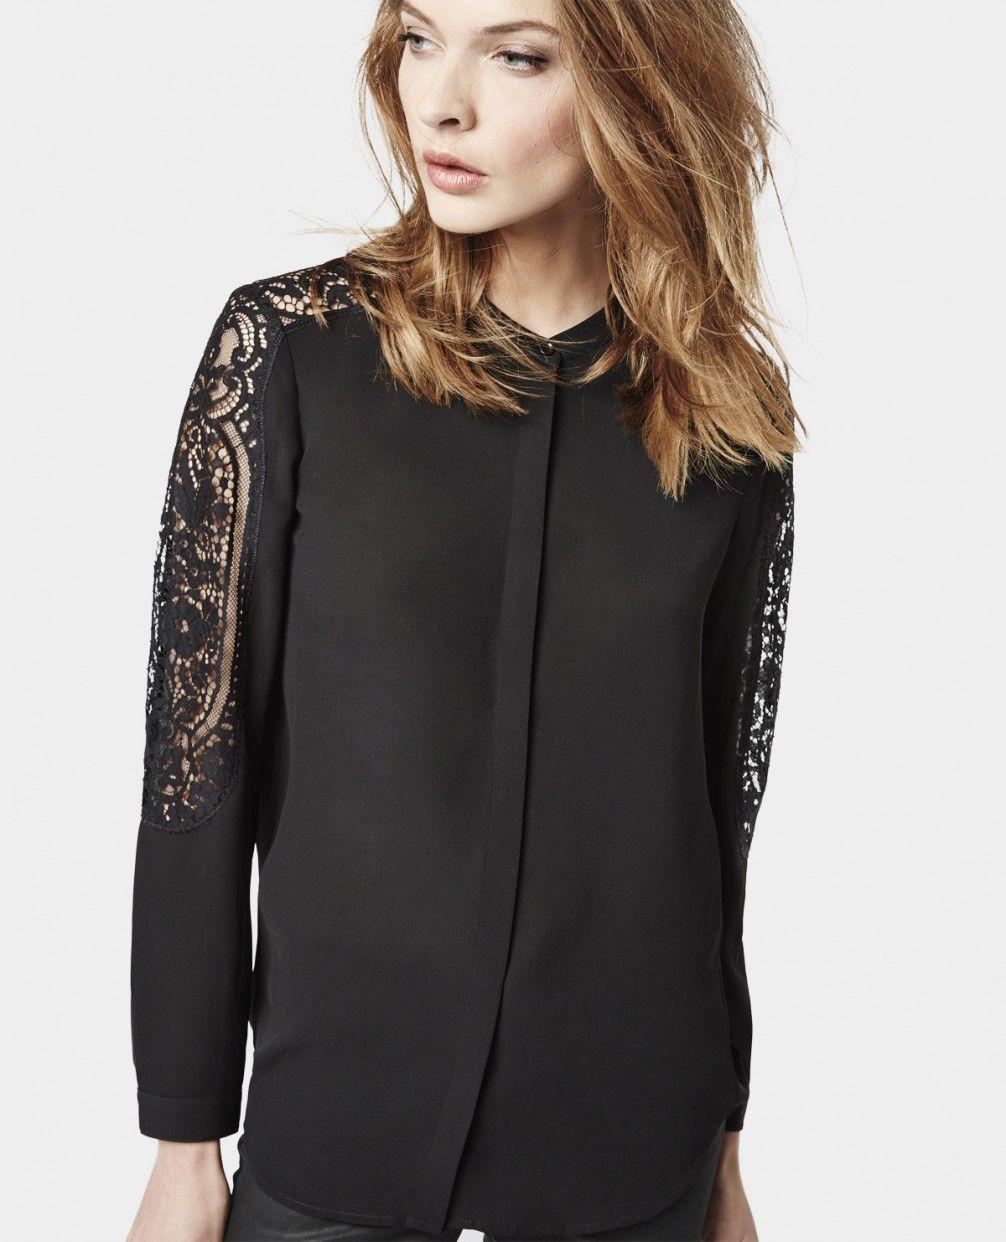 Chemise à incrustation de dentelle - Chemises - Femme - The Kooples